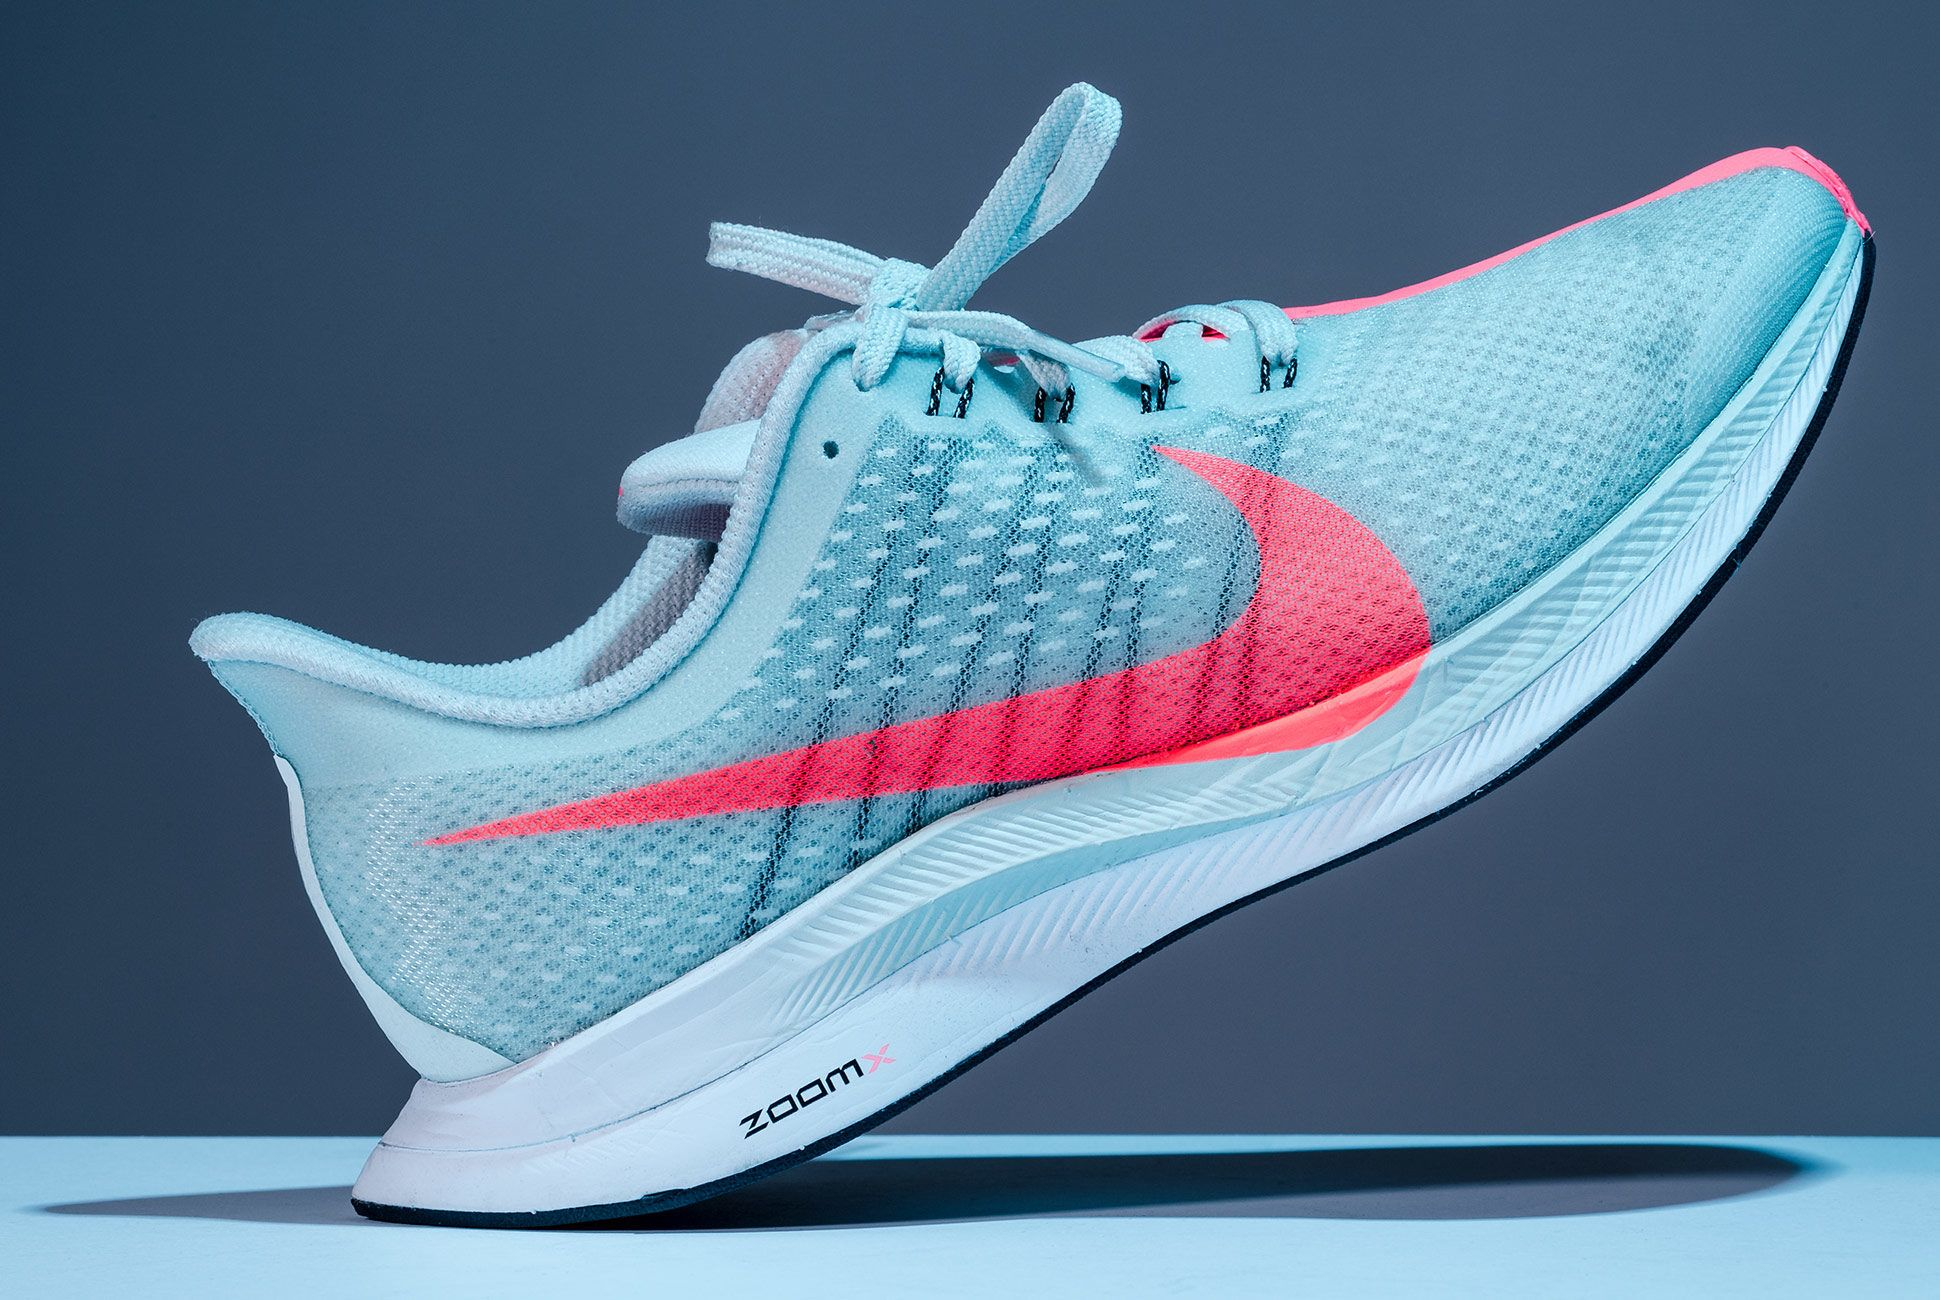 Nike-Pegasus-Turbo-Review-gear-patrol-slide-2